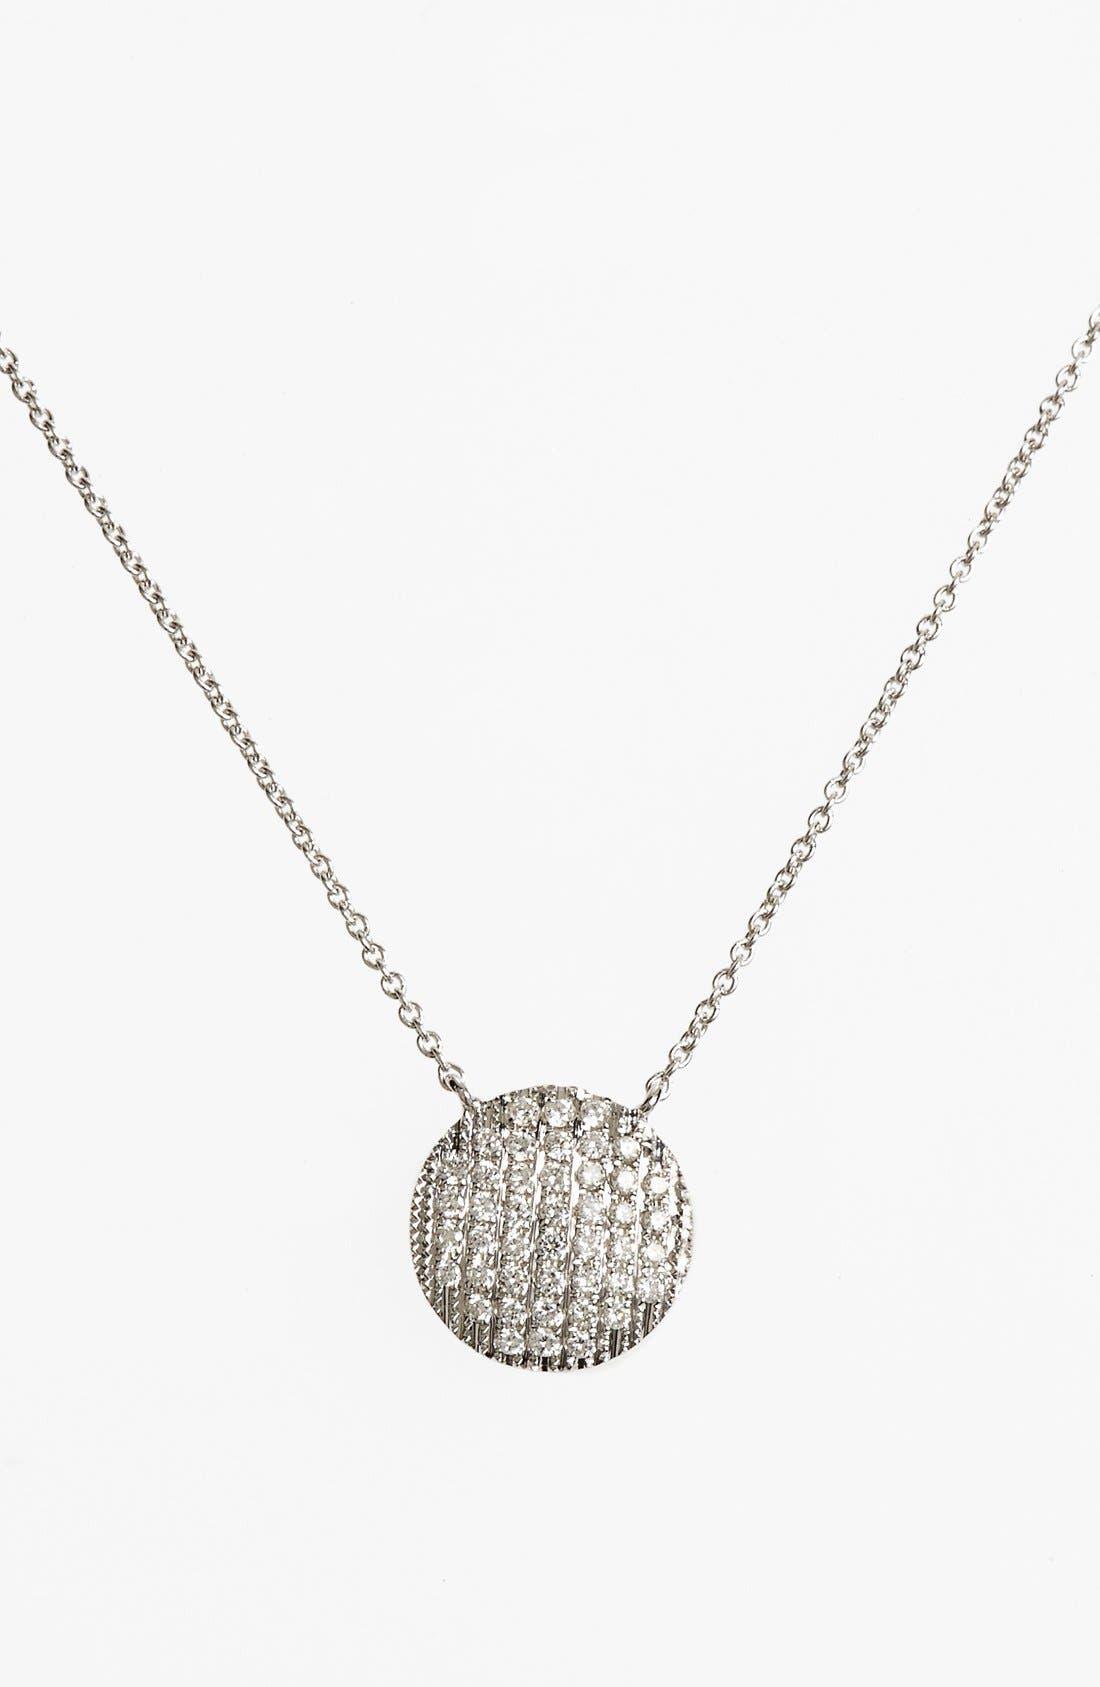 DANA REBECCA DESIGNS 'Lauren Joy' Diamond Disc Pendant Necklace, Main, color, WHITE GOLD